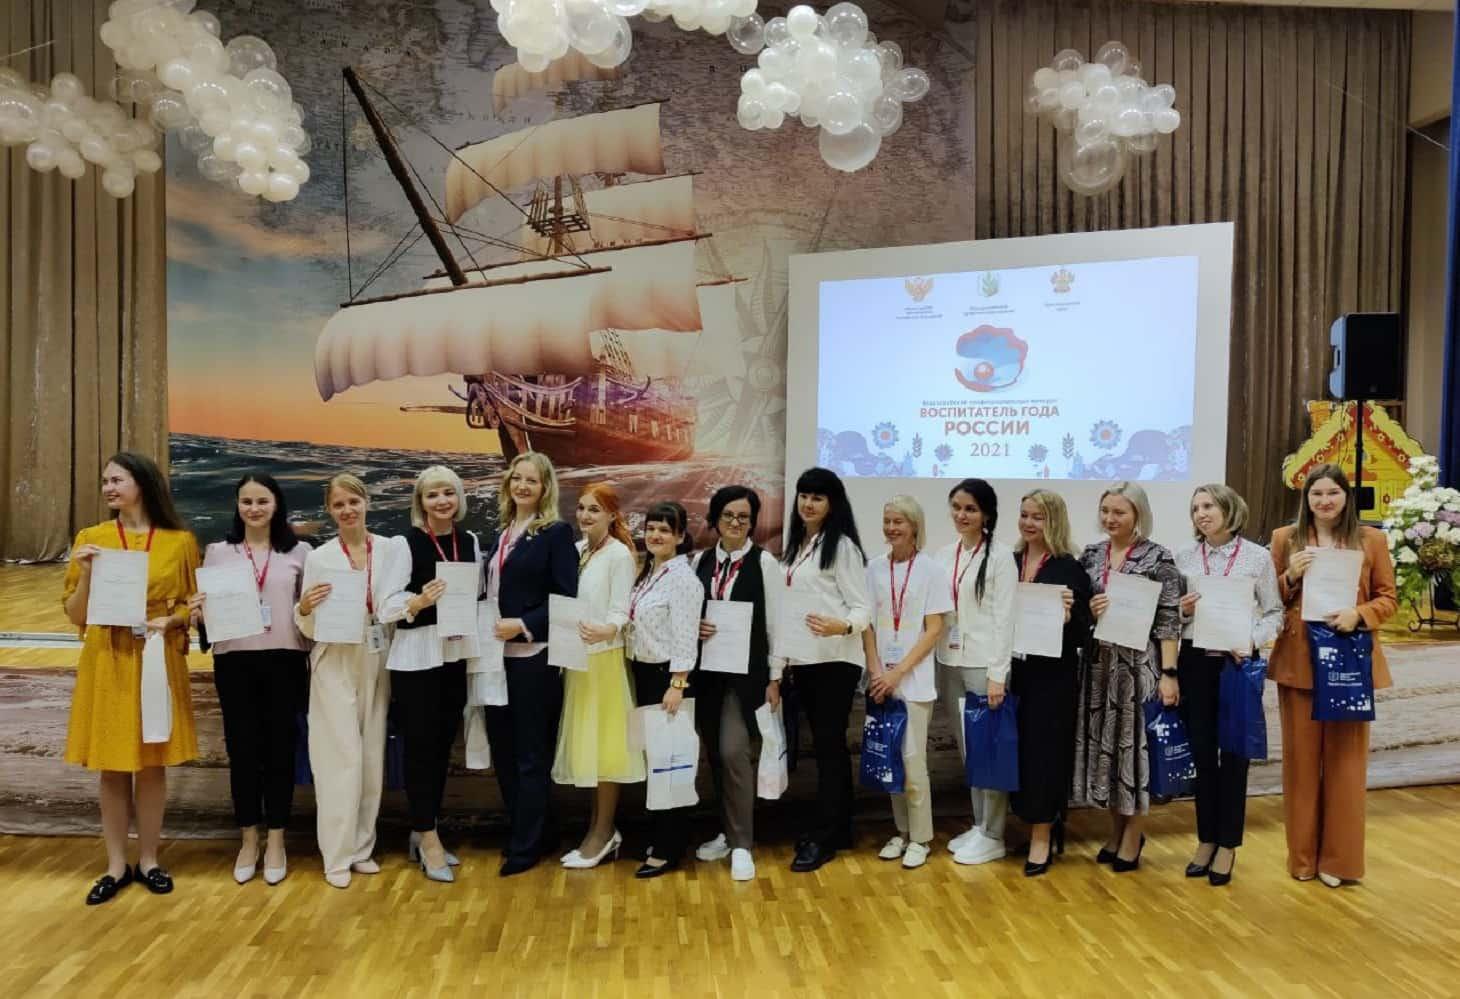 stali-izvestny-imena-laureatov-konkursa-vospitatel-goda-2021